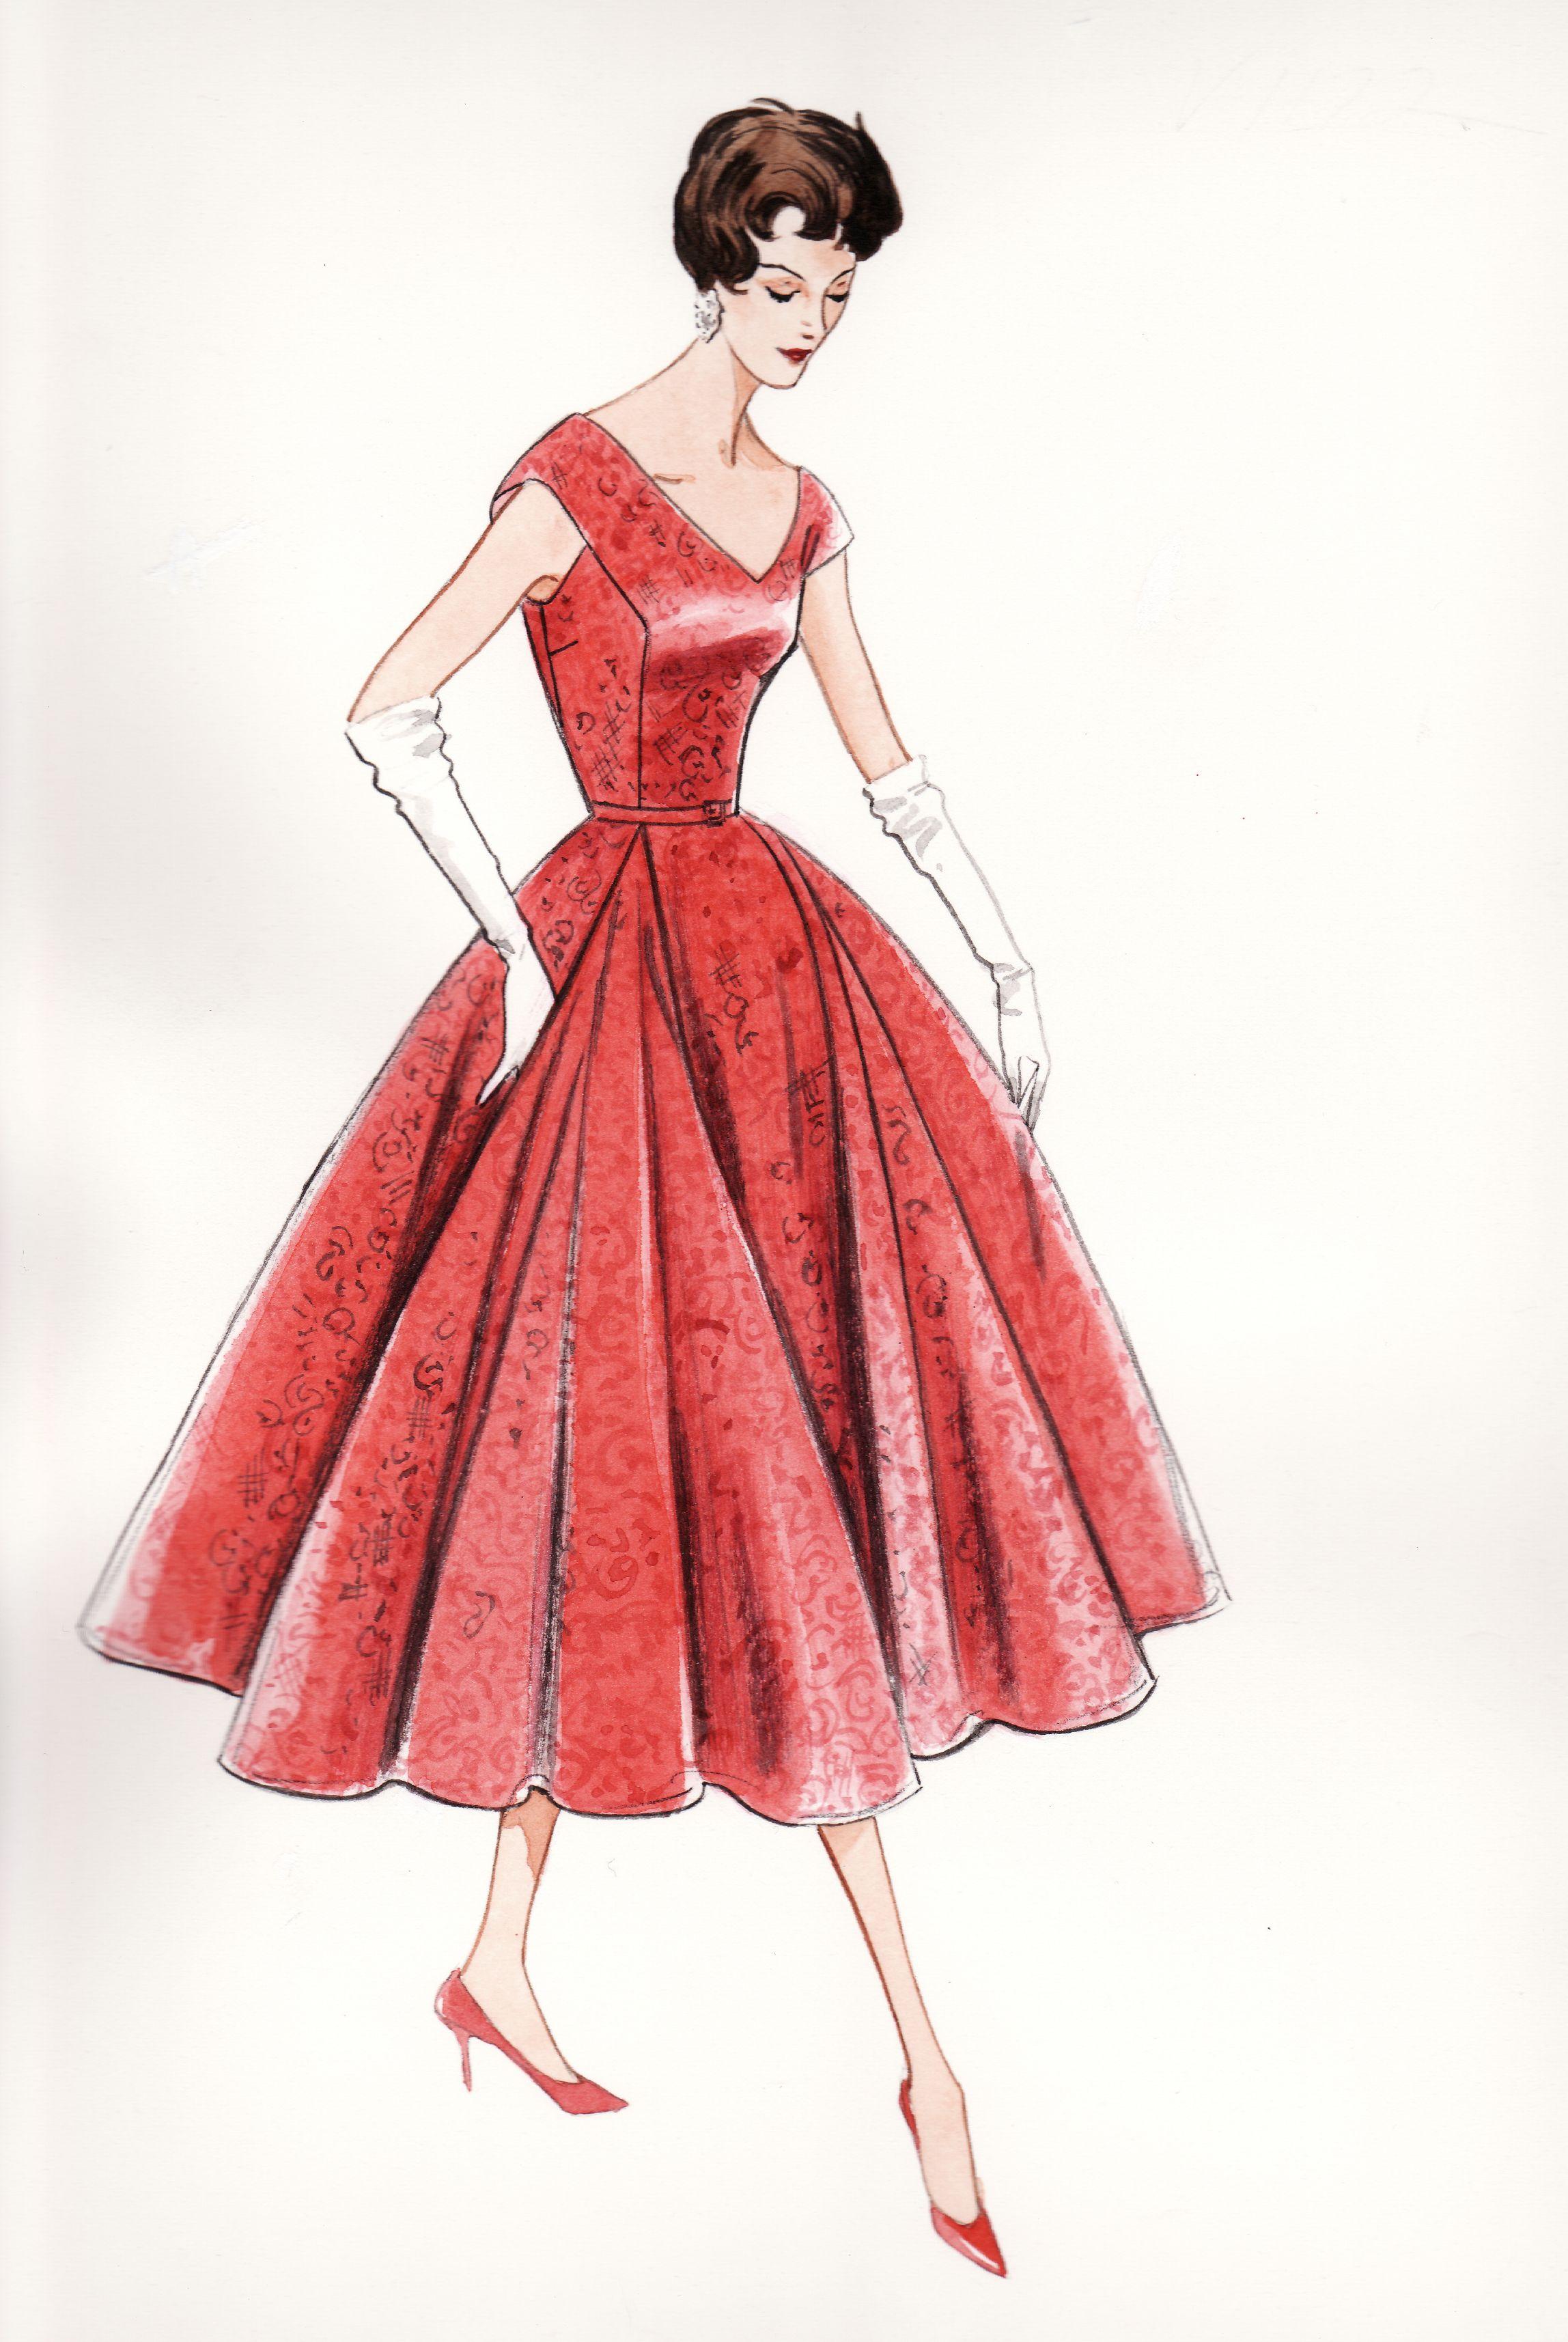 Fashion illustration for Butterick's Vintage Vogue. -Lamont O'Neal